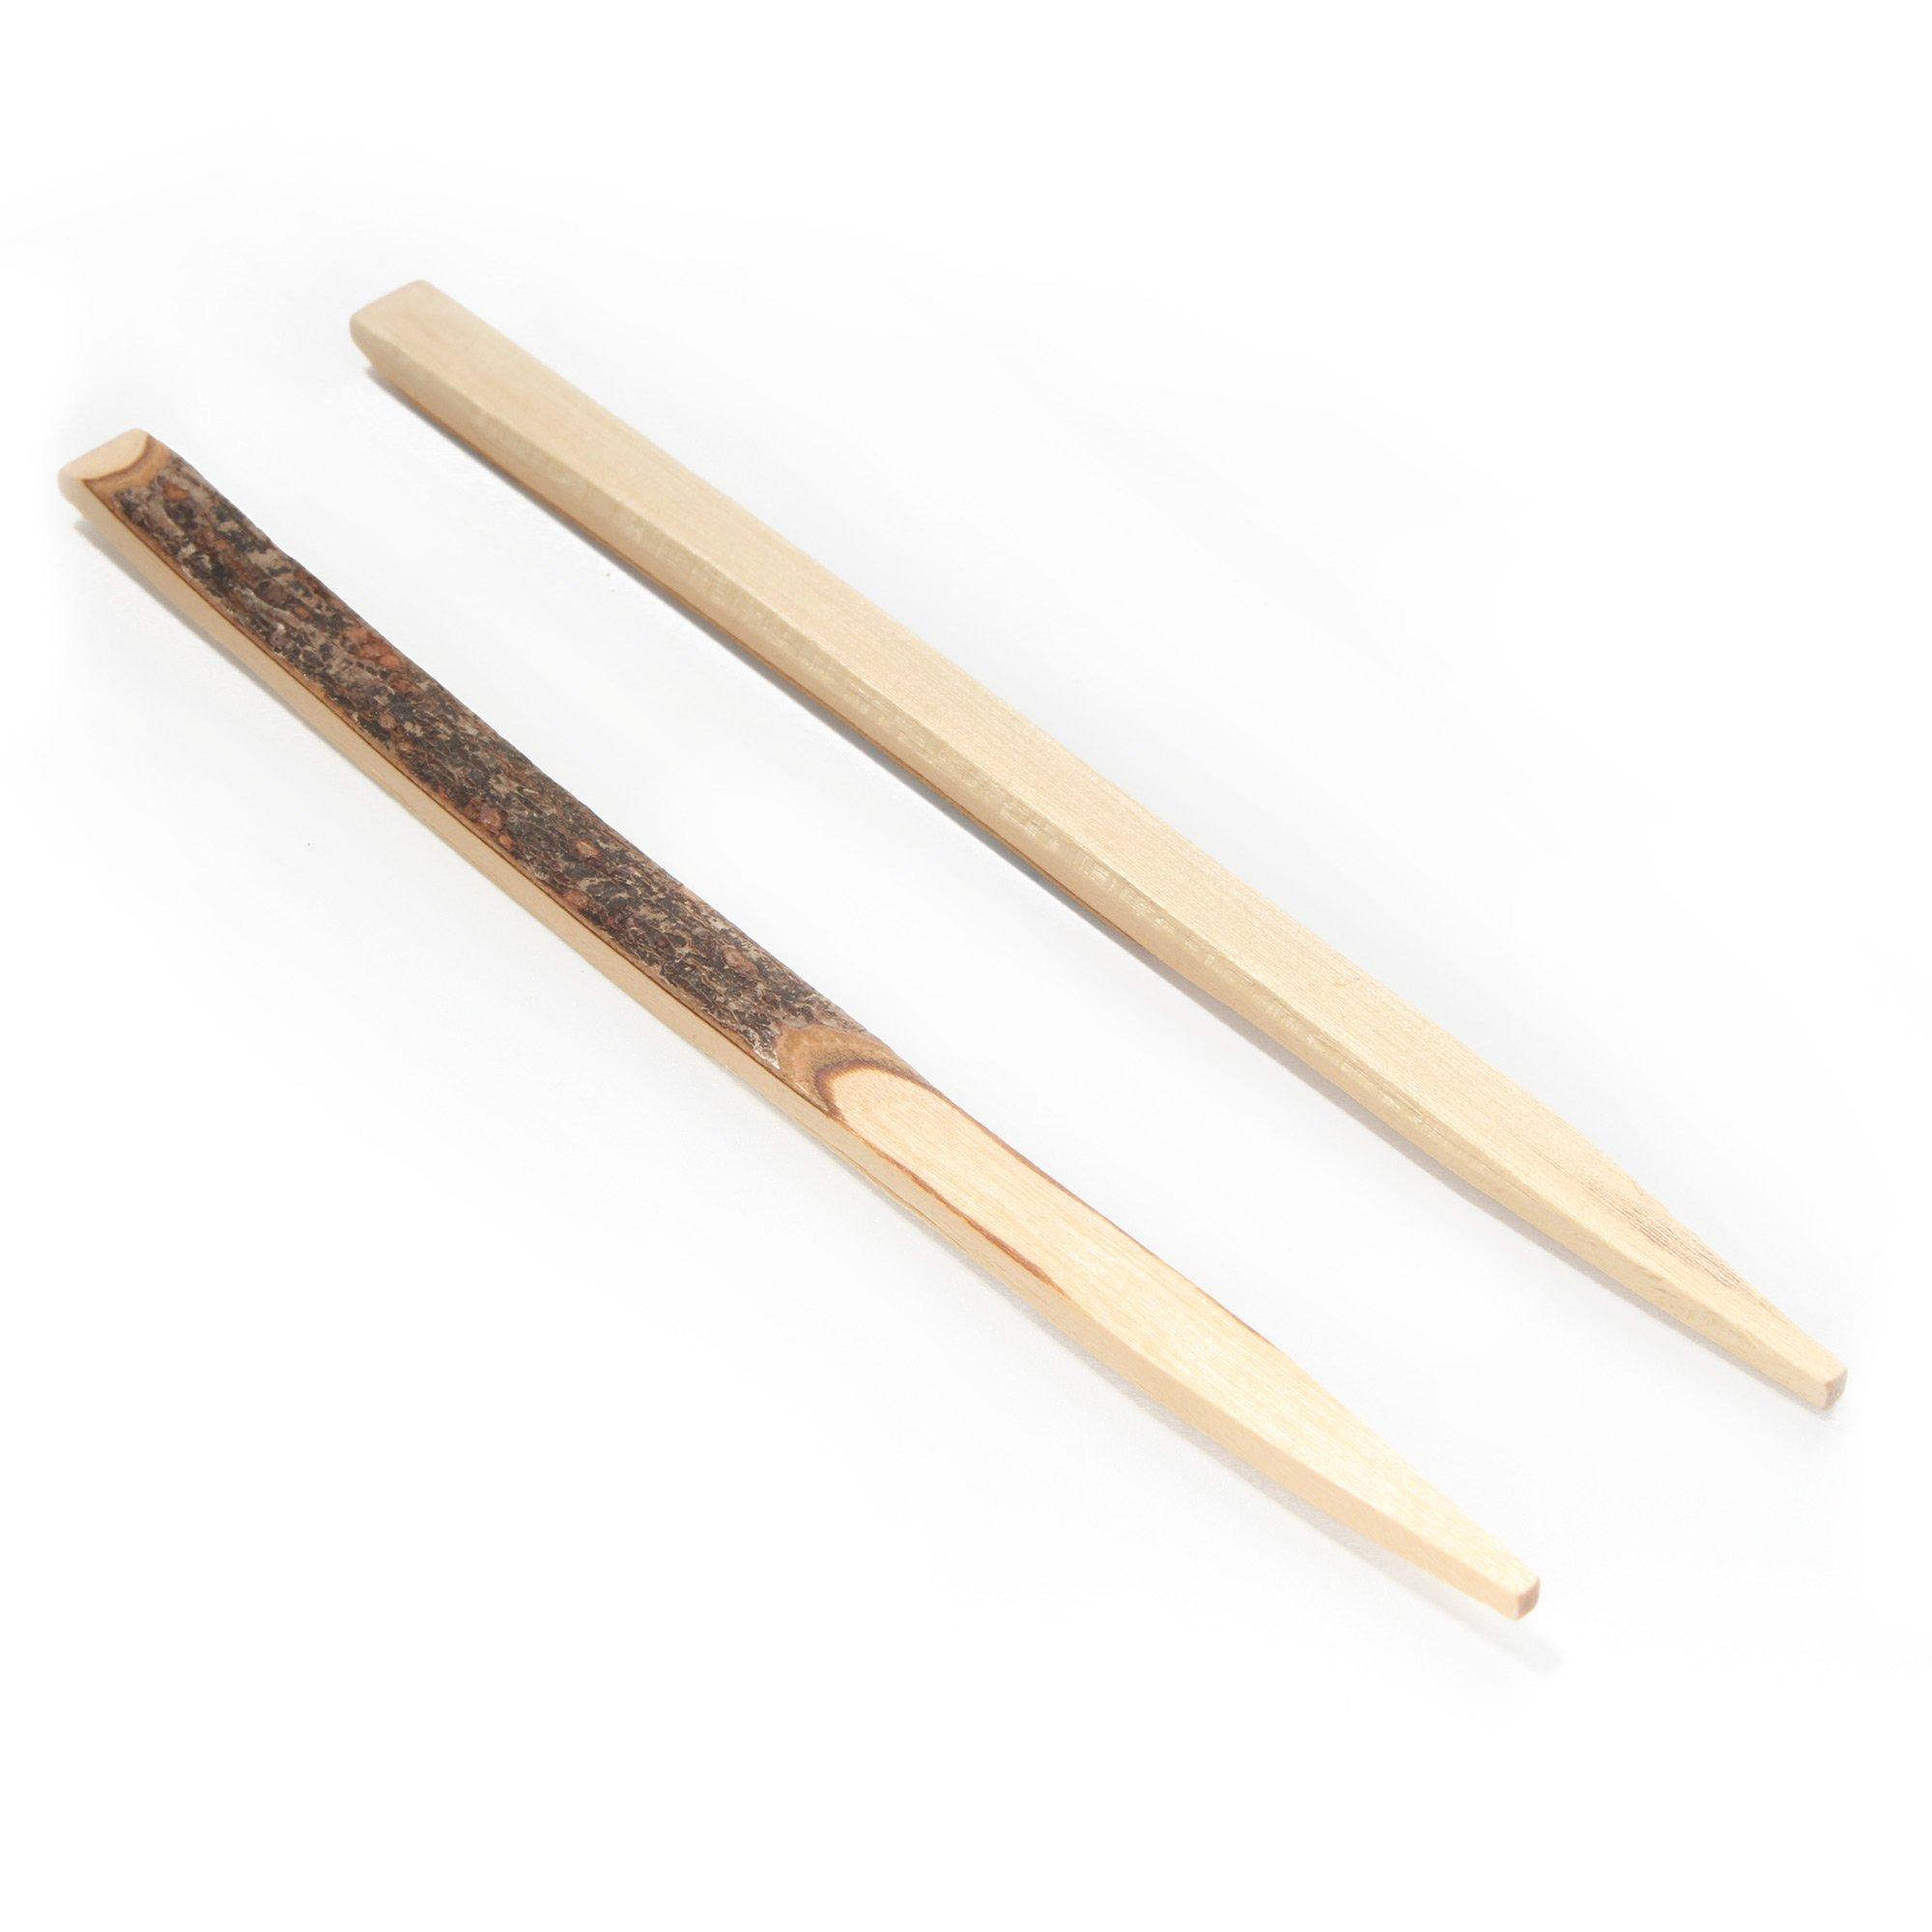 BambooMN Brand - Decorative Black Willow Appetizer Picks - 4.75'' (12cm) - 1000 Pieces